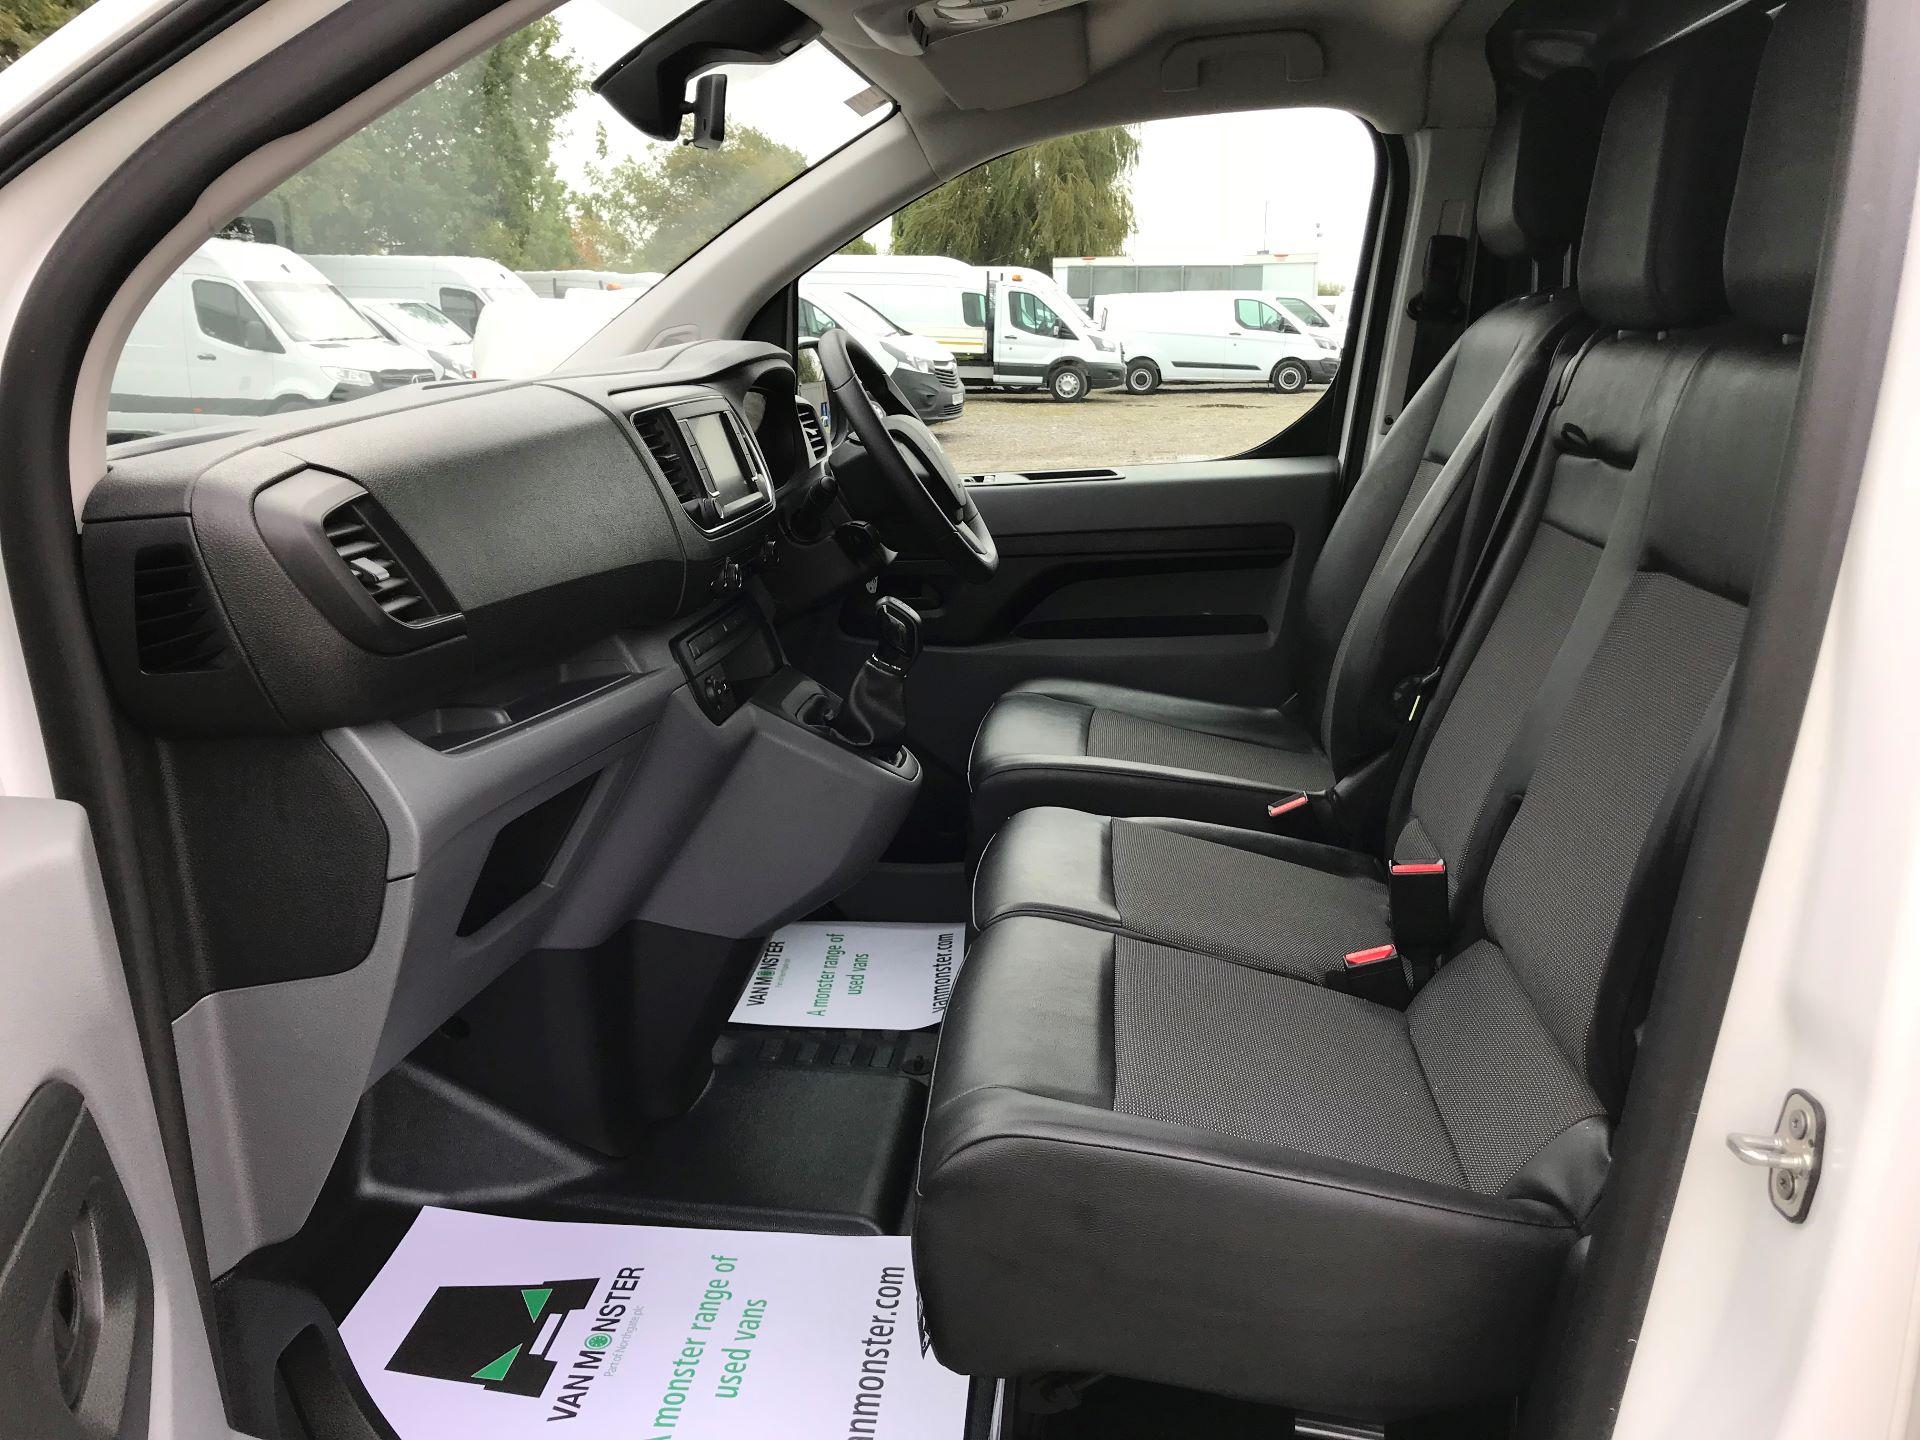 2018 Peugeot Expert STANDARD 1000 1.6 BLUEHDI 95 PROFESSIONAL EURO 6 (NU18PFO) Image 16